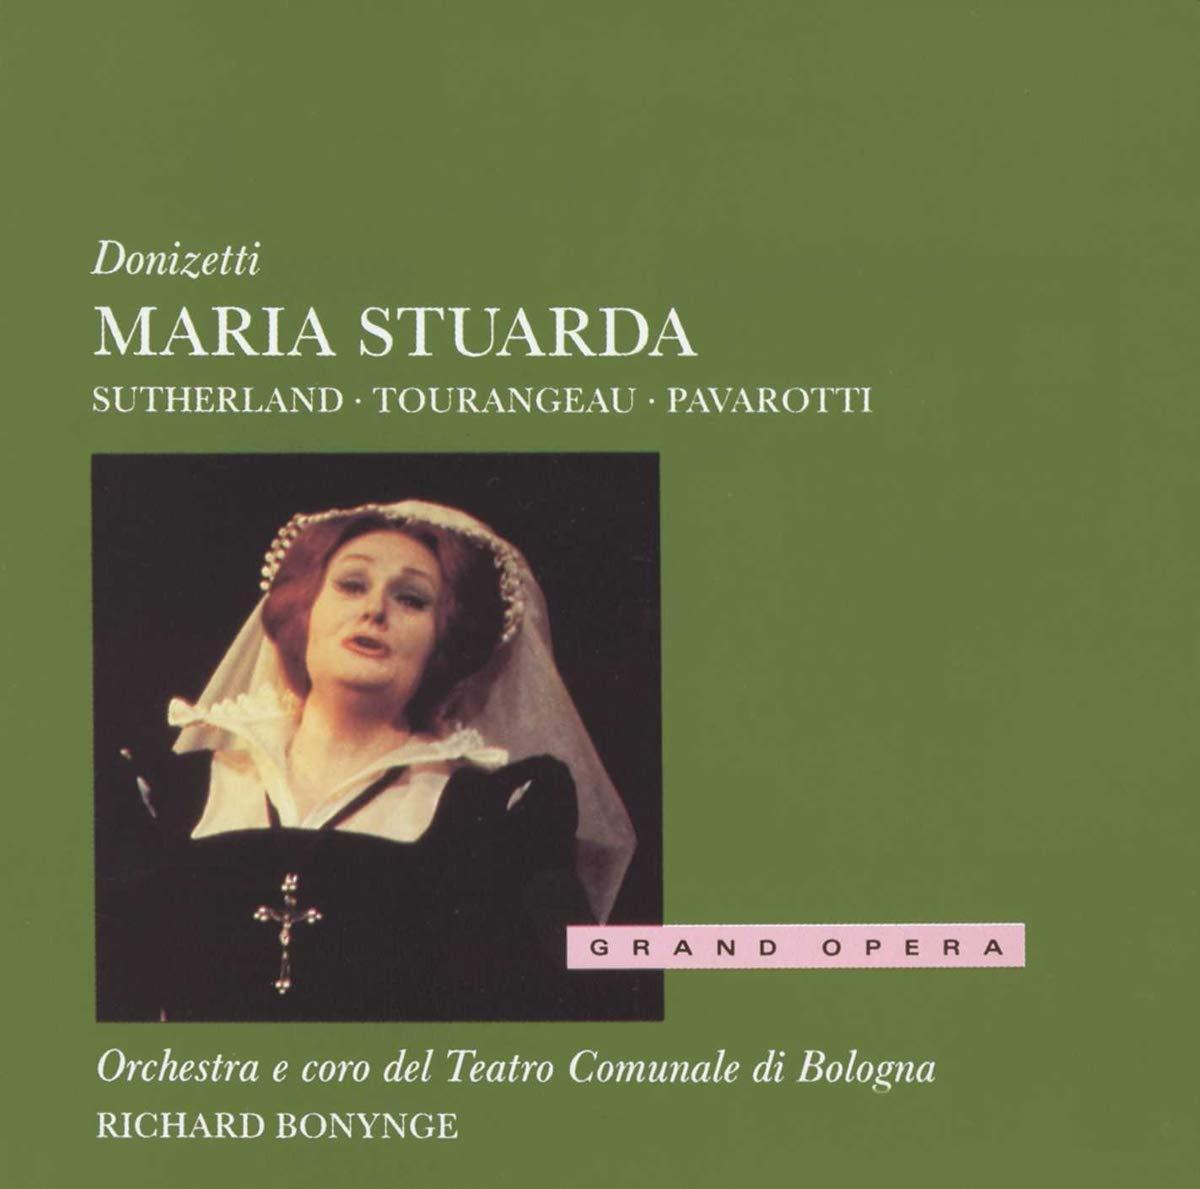 Special sale item 70% OFF Outlet Donizetti - Maria Stuarda Sutherland Comunale di Bolog Teatro